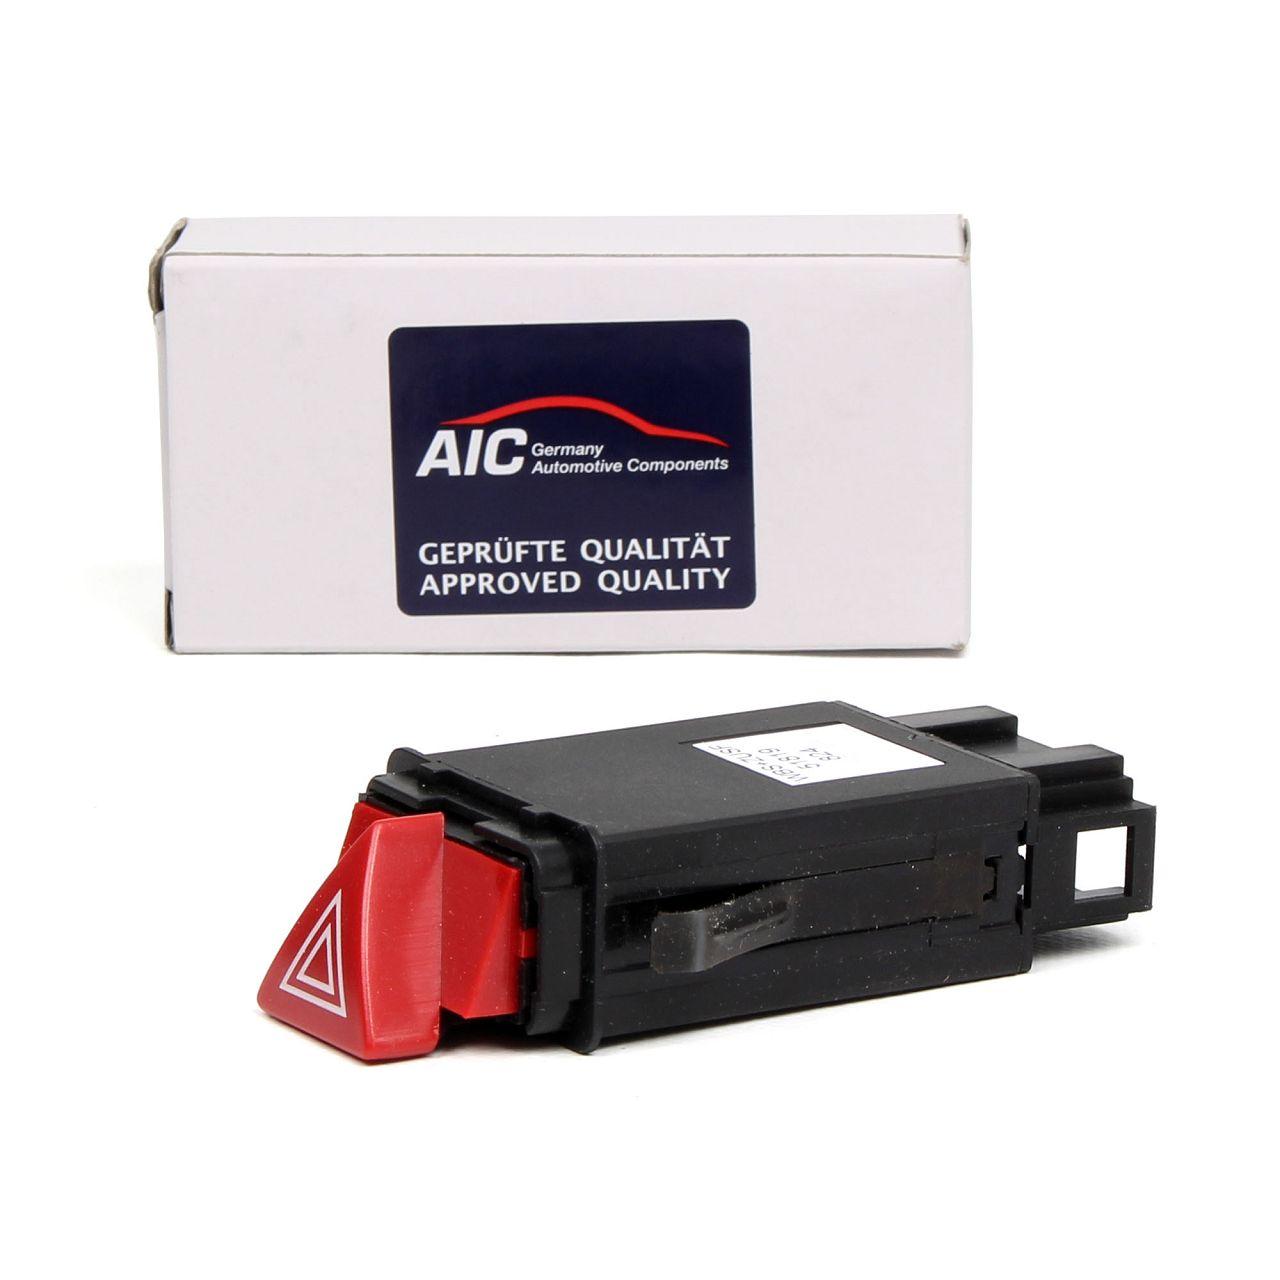 AIC Warnblinkschalter Relais Warnblinklicht für AUDI A6 (4B C5) ab 08.1998